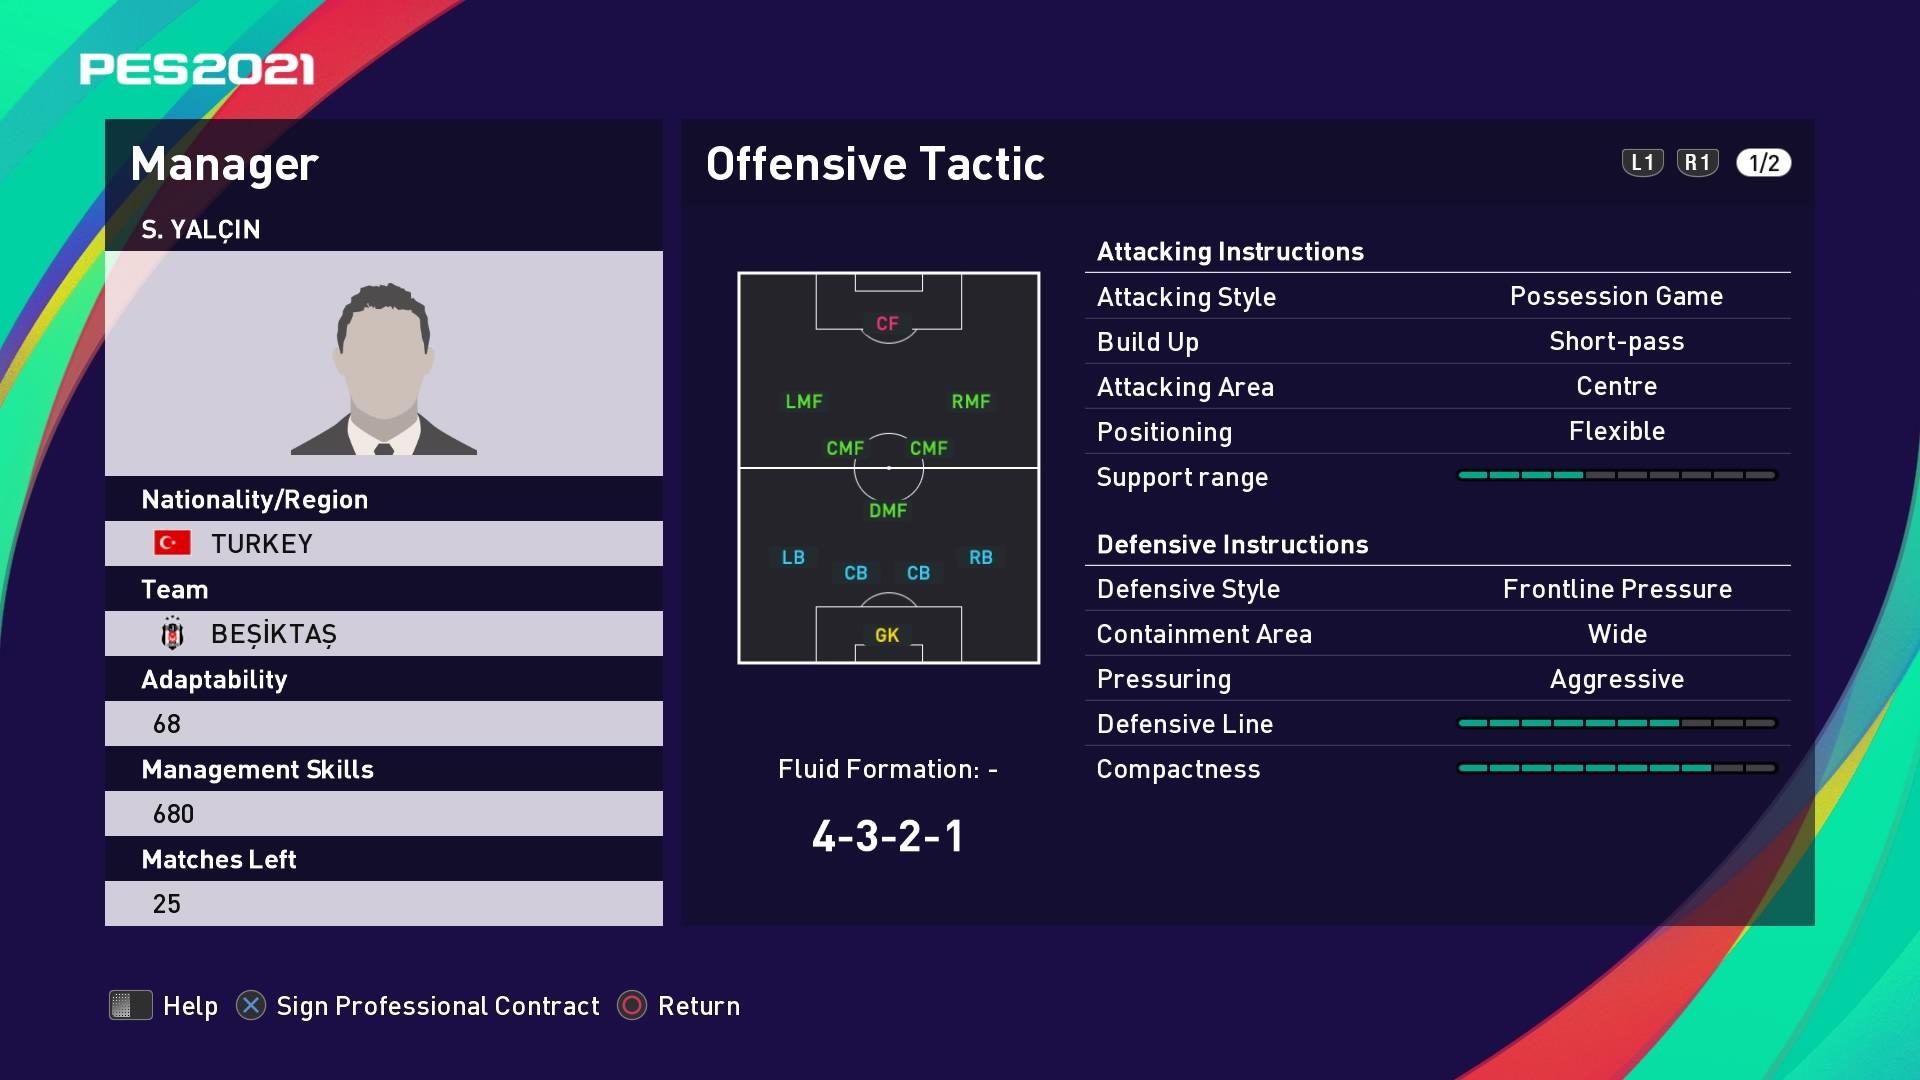 S. Yalçın (Sergen Yalçın) Offensive Tactic in PES 2021 myClub